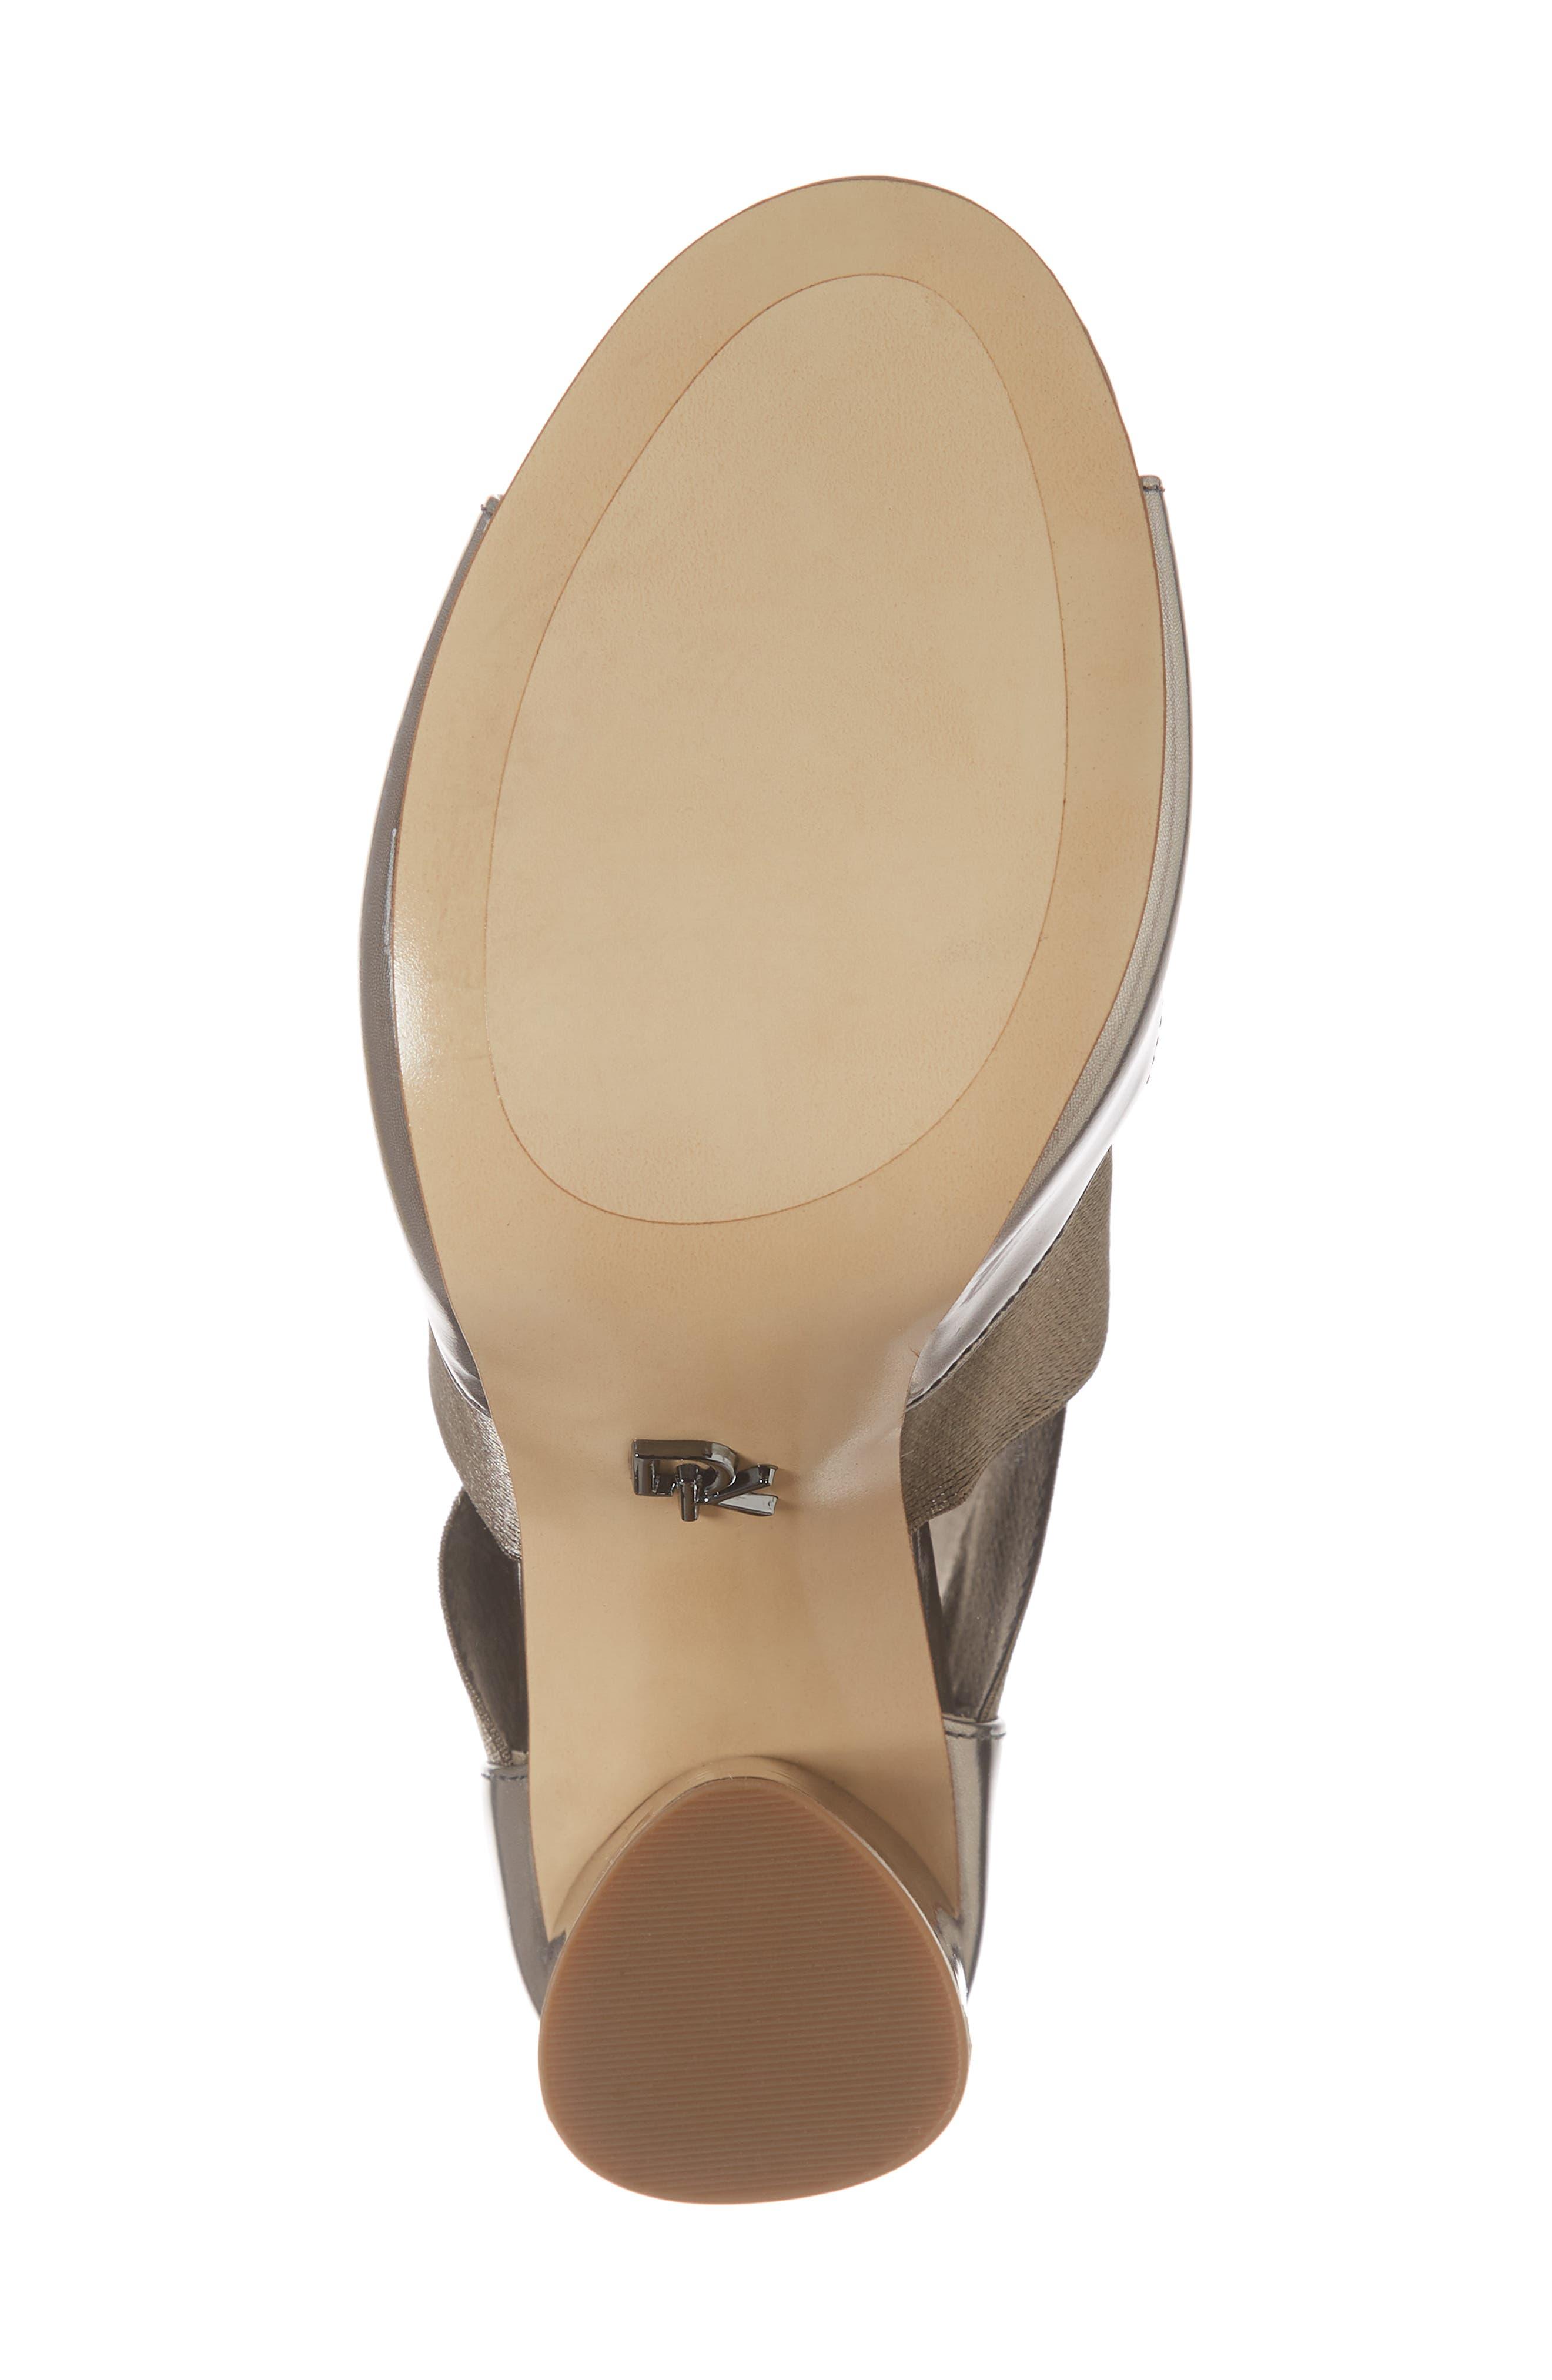 Donna Karan Briana Strappy High Sandal,                             Alternate thumbnail 6, color,                             DARK PEWTER